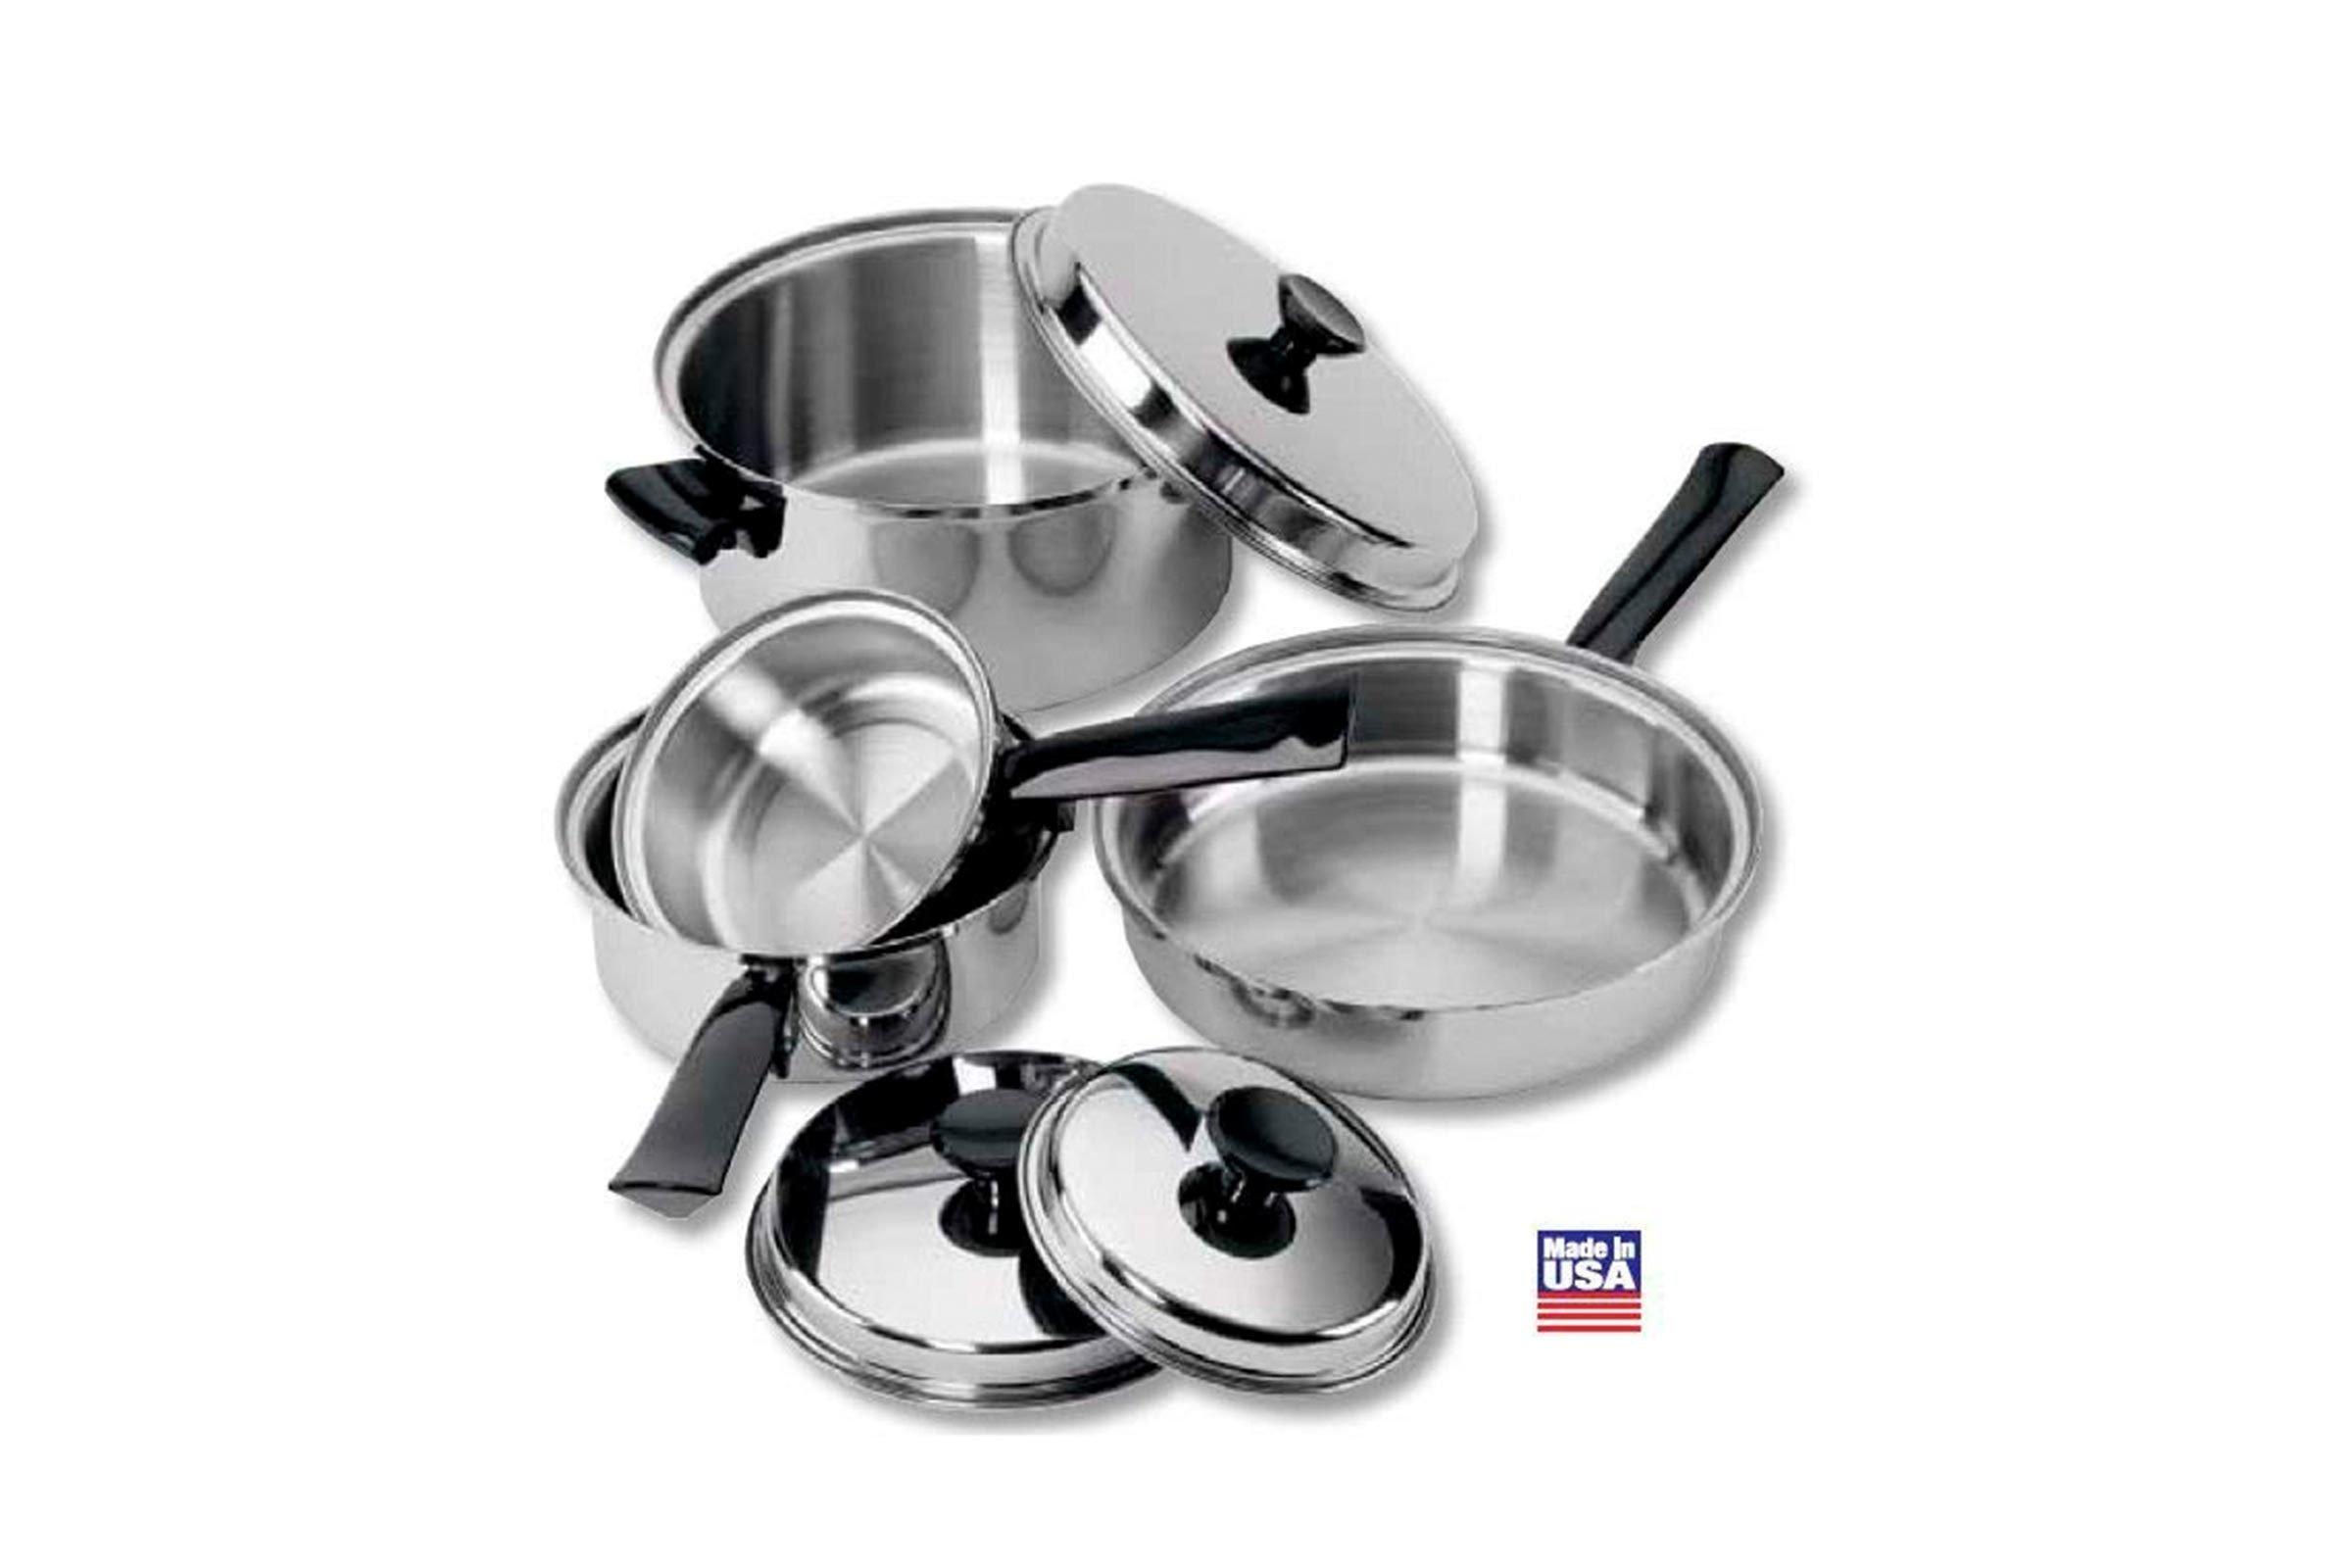 Regal ware cookware